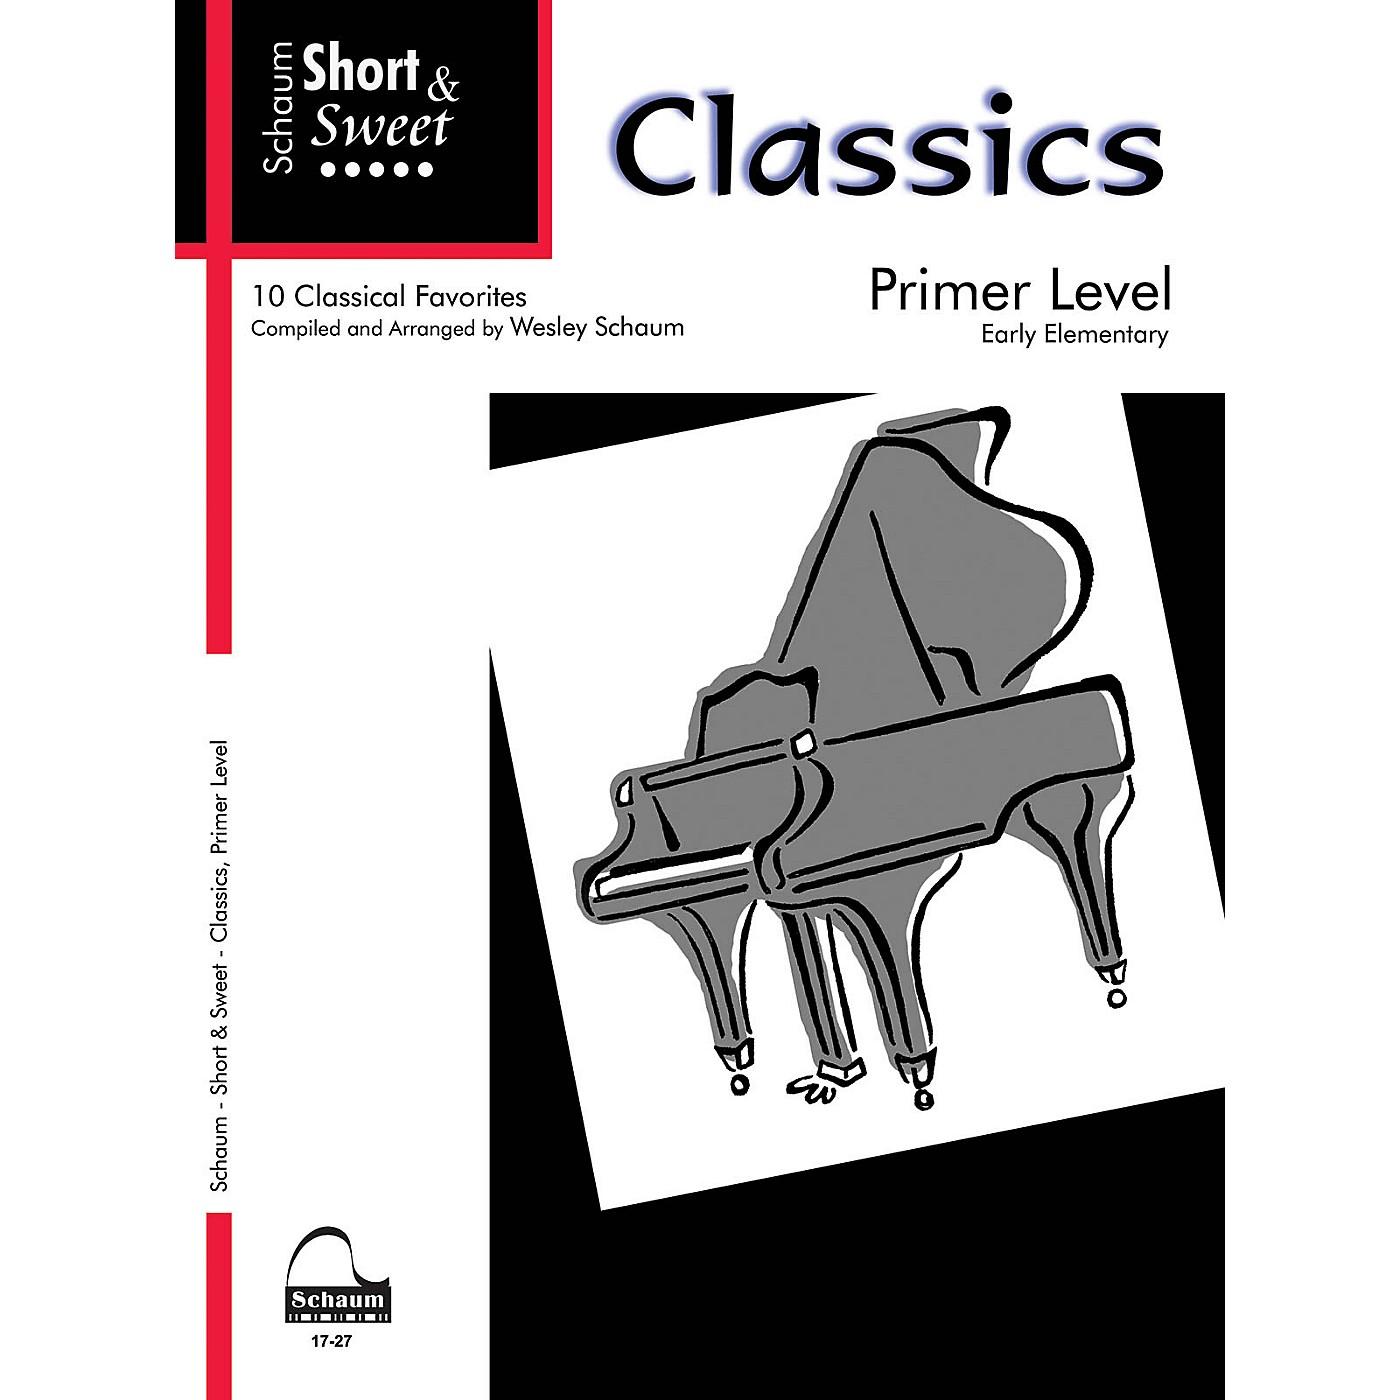 SCHAUM Short & Sweet: Classics (Primer Level Early Elem Level) Educational Piano Book thumbnail